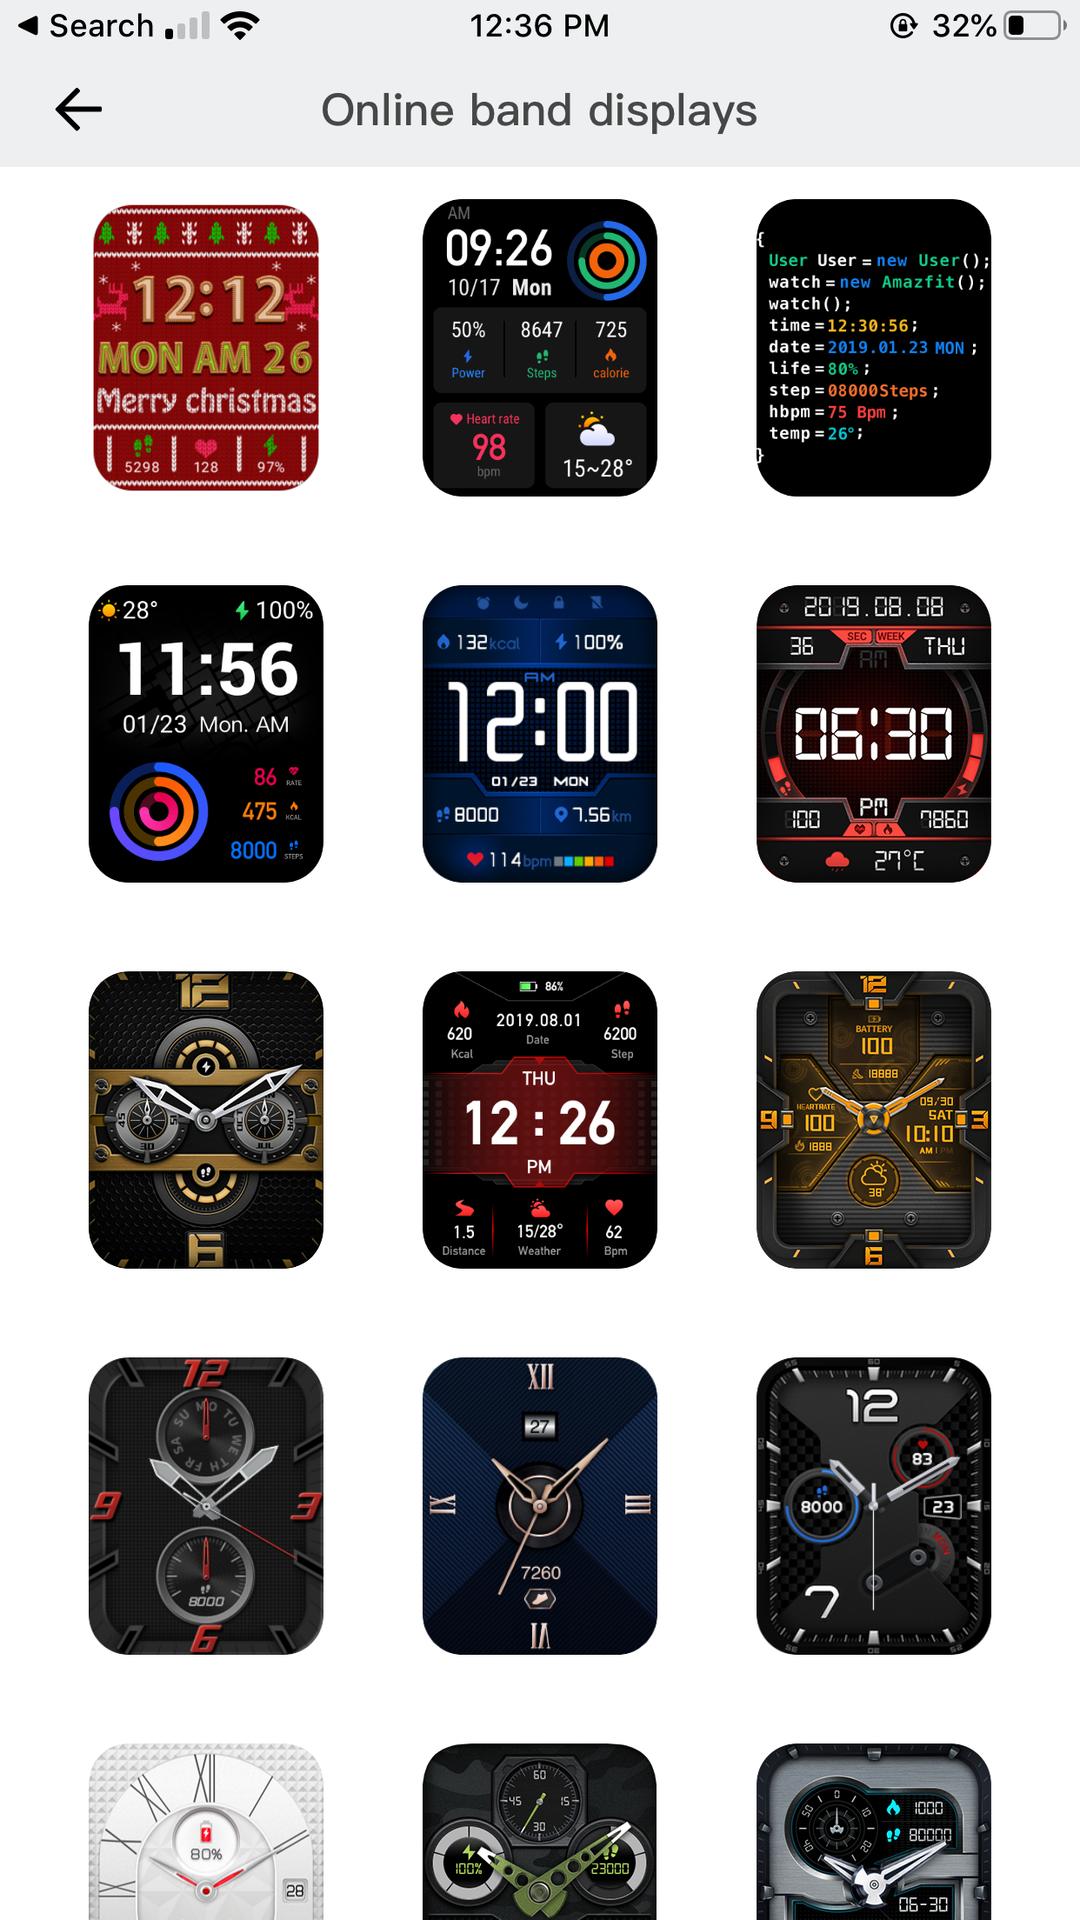 Amazfit GTS Watchfaces displayed on App